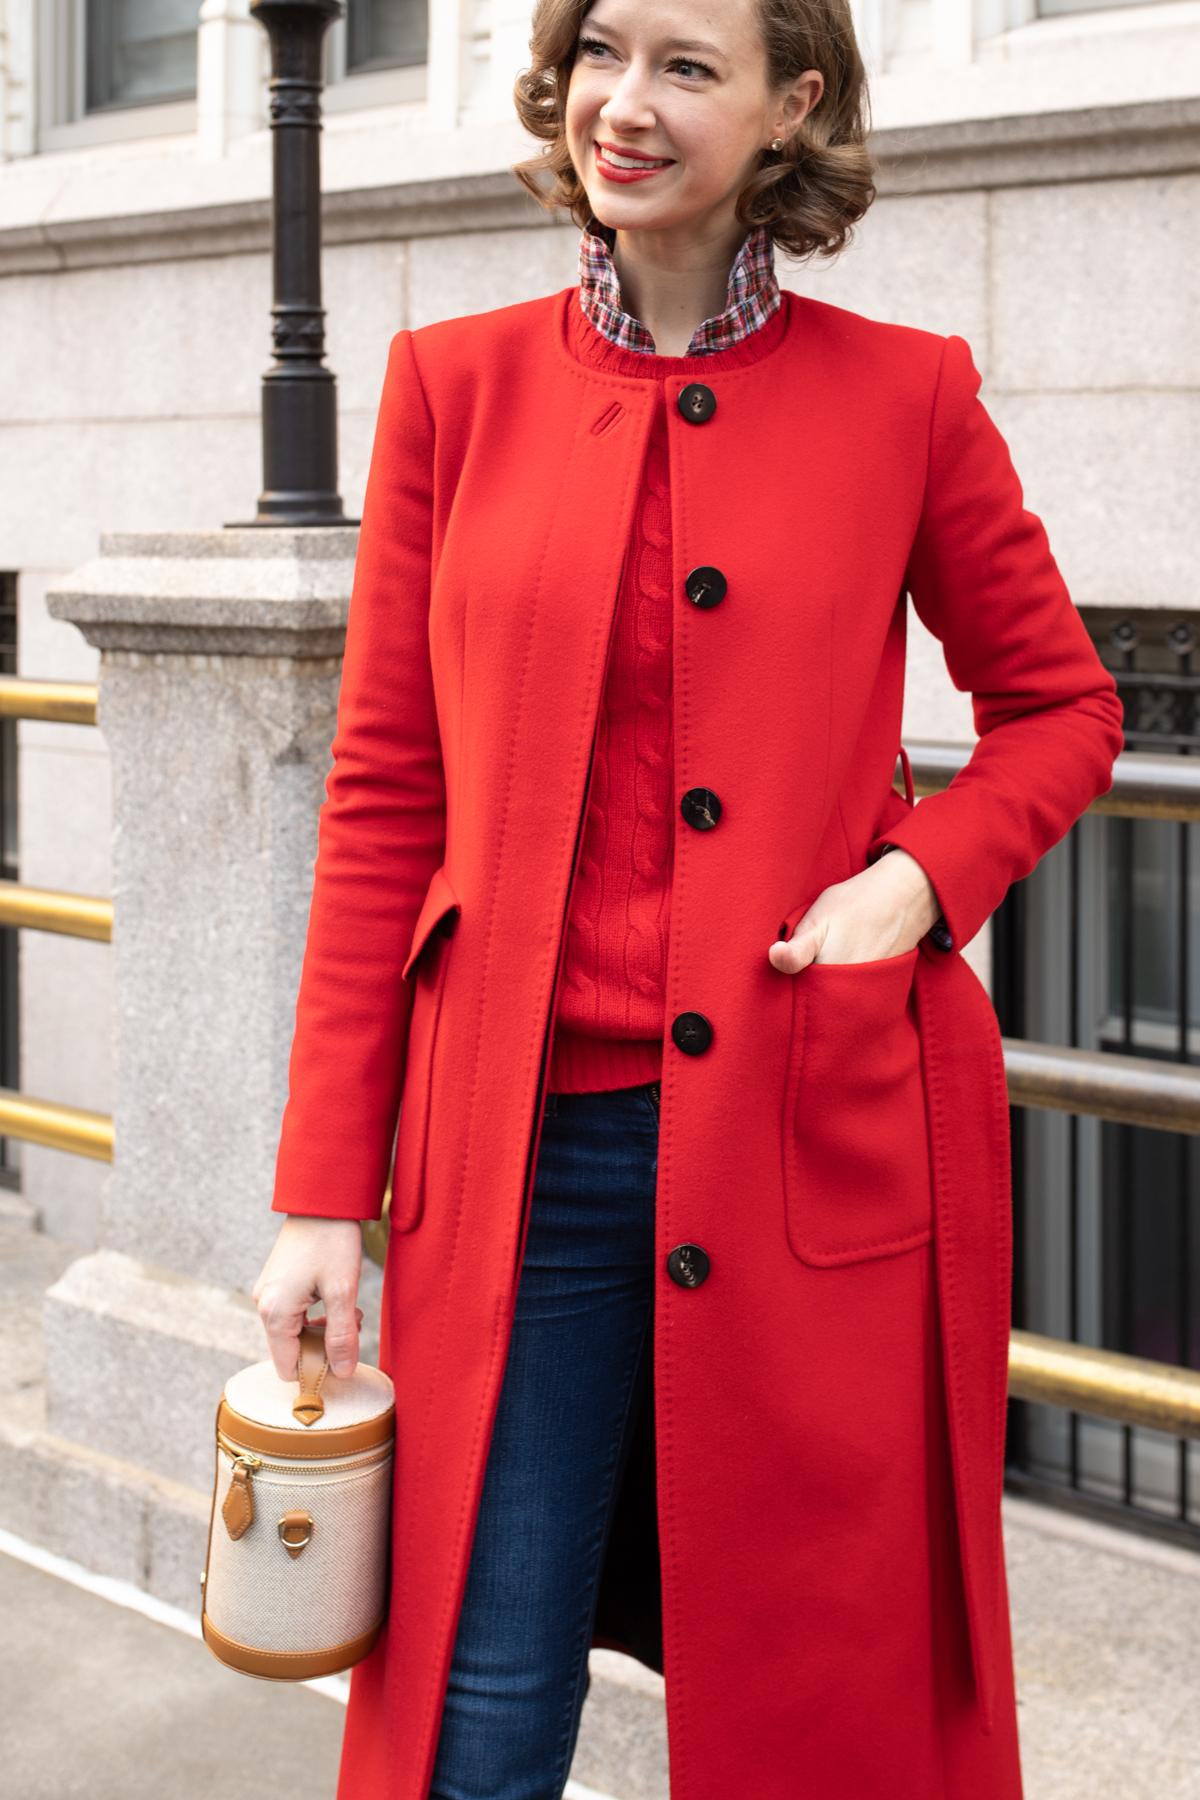 BrooksBrothers Red Coat x Stacie Flinner-4.jpg